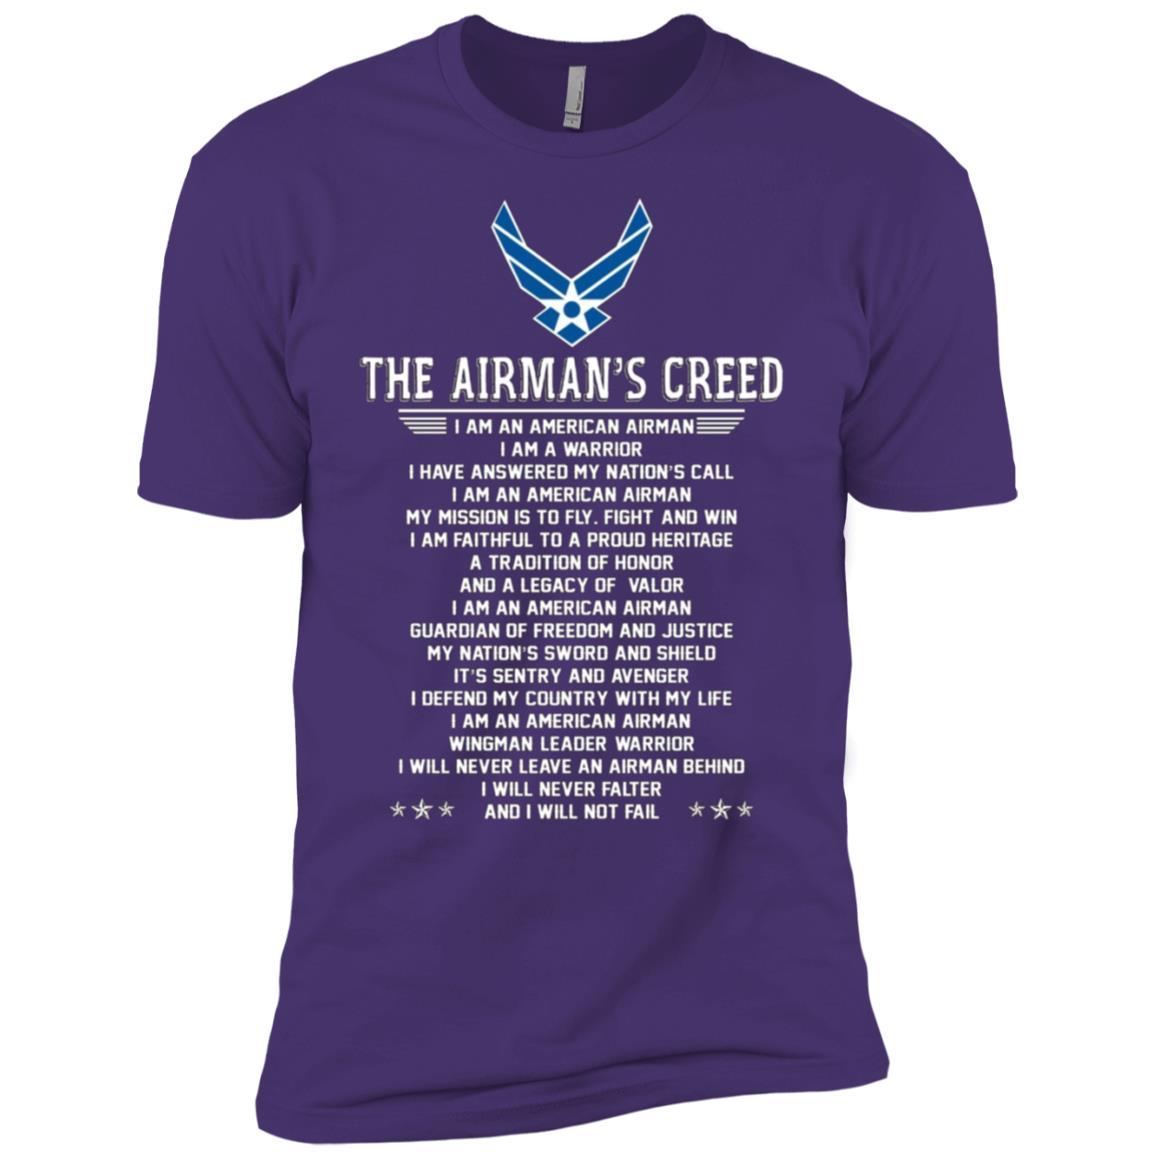 The Airman's Creed Men Short Sleeve T-Shirt